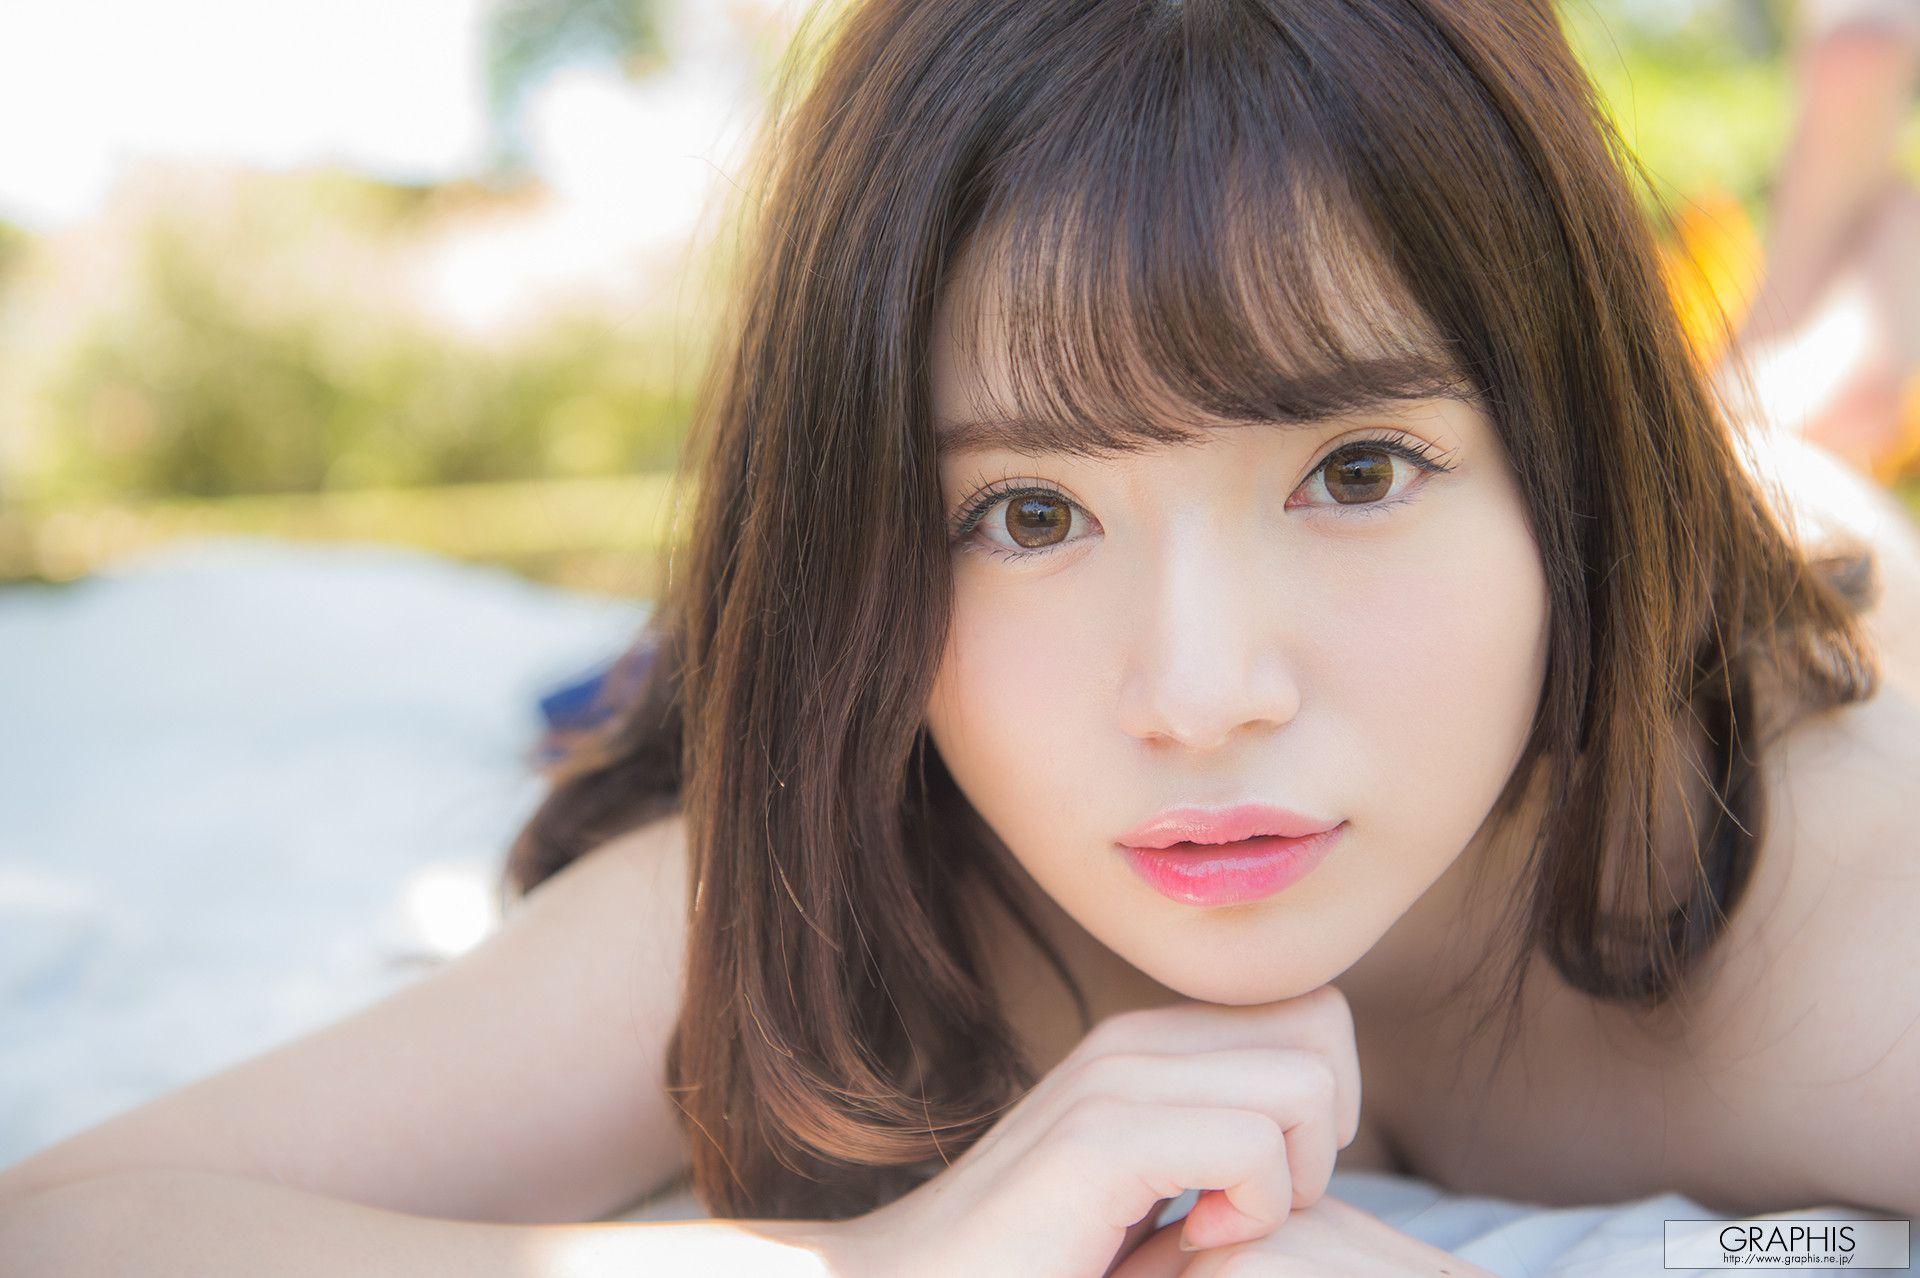 VOL.660 [Graphis]女艺人:樱羽和佳(桜羽のどか)超高清写真套图(12P)